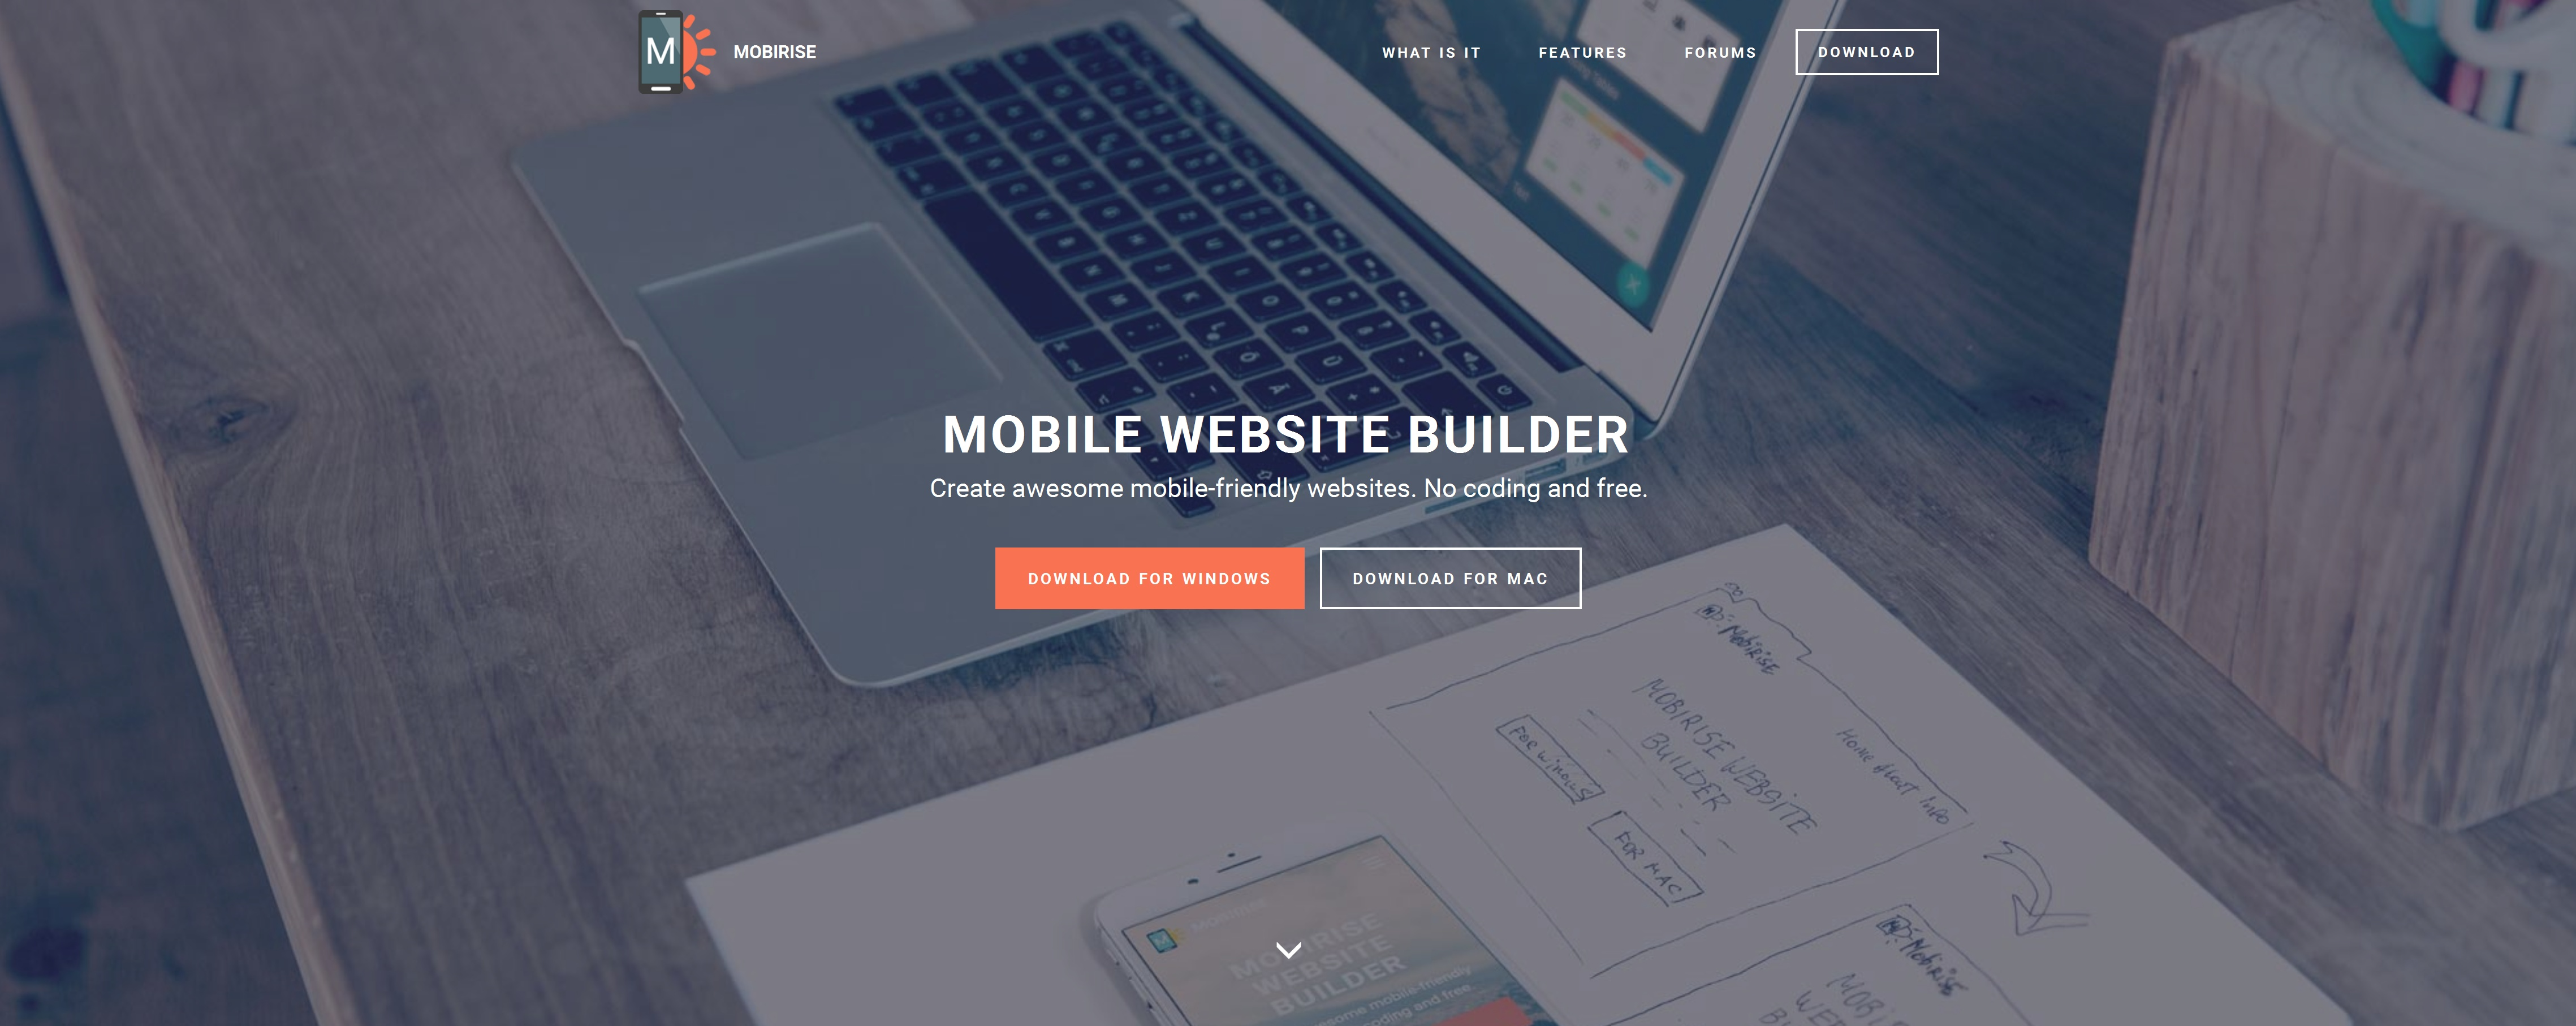 Mobile Website Generator Review